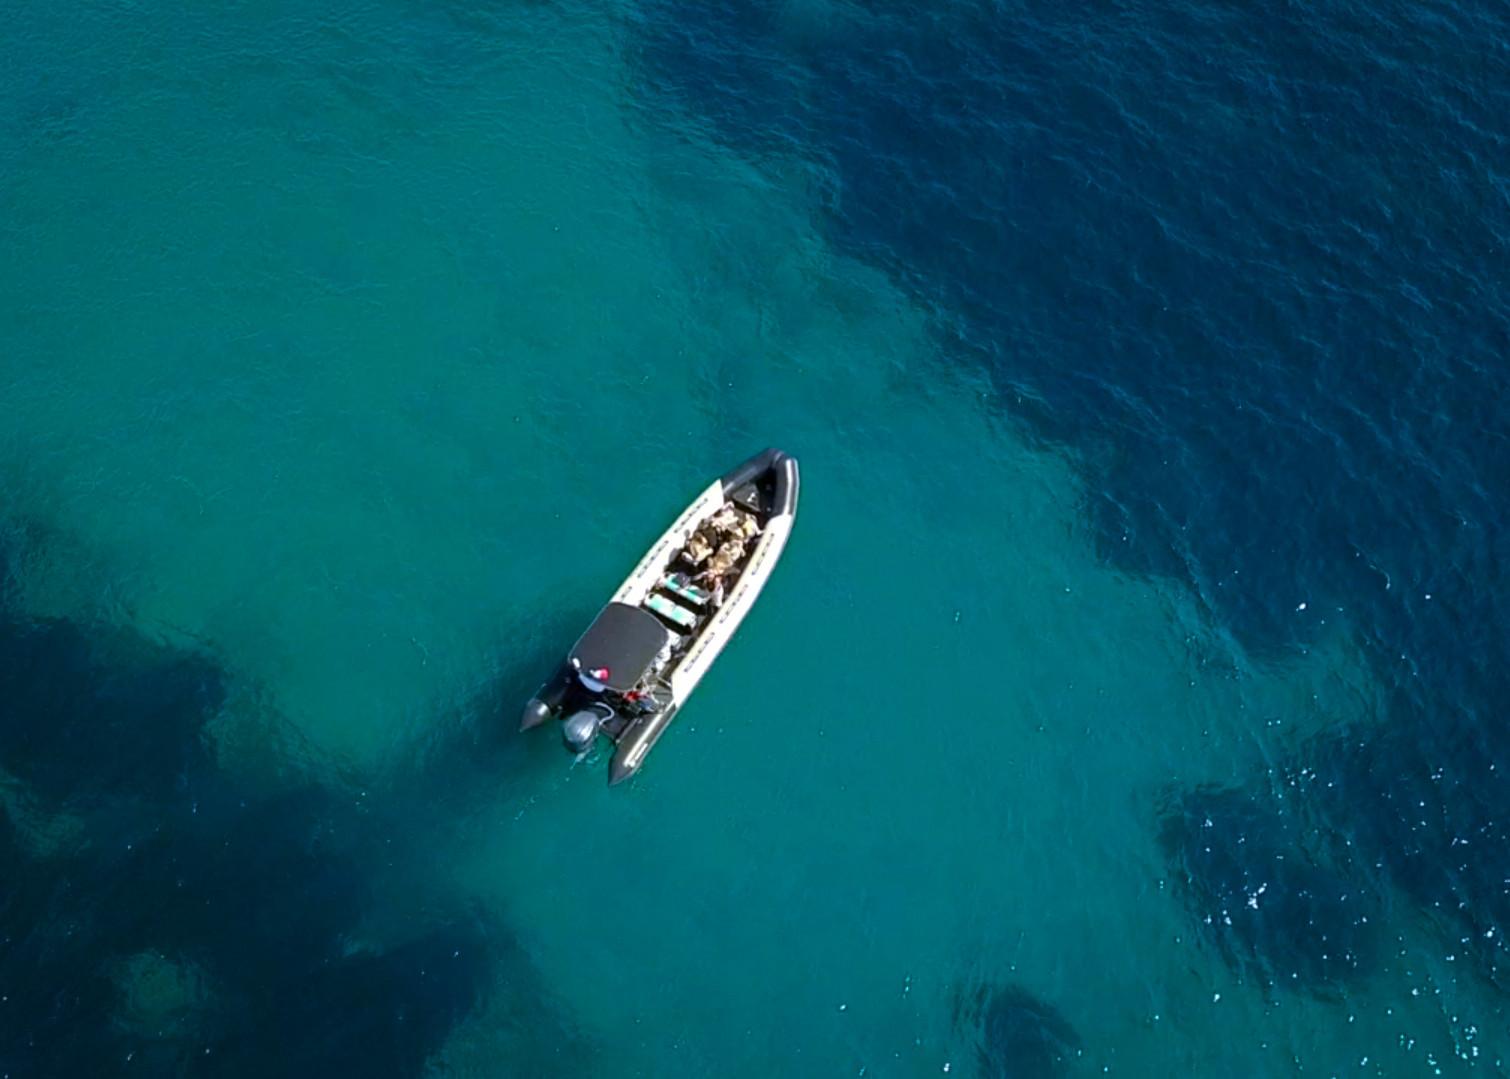 Saint Raphael's boat with Sea you sun